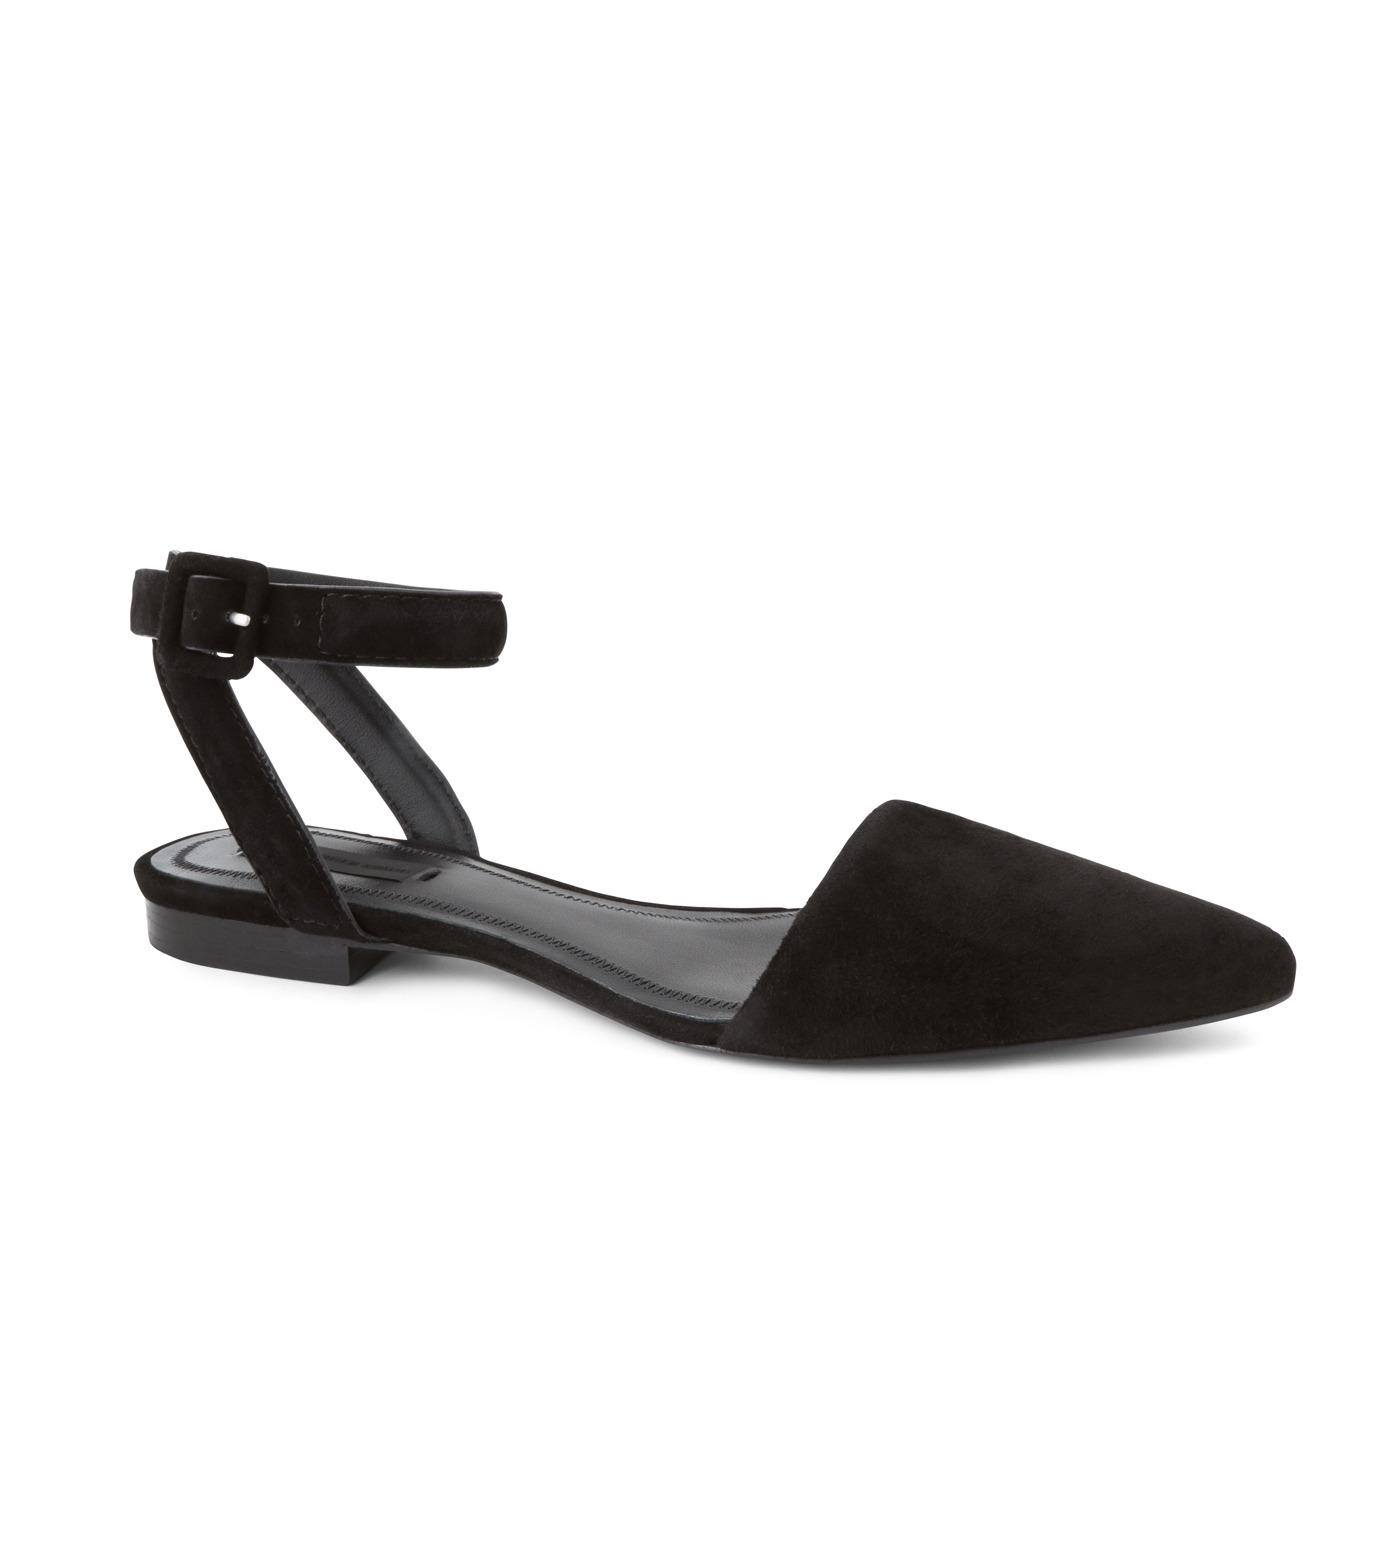 Alexander Wang(アレキサンダーワン)のLauren Flat-BLACK(シューズ/shoes)-301129P16-13 拡大詳細画像1